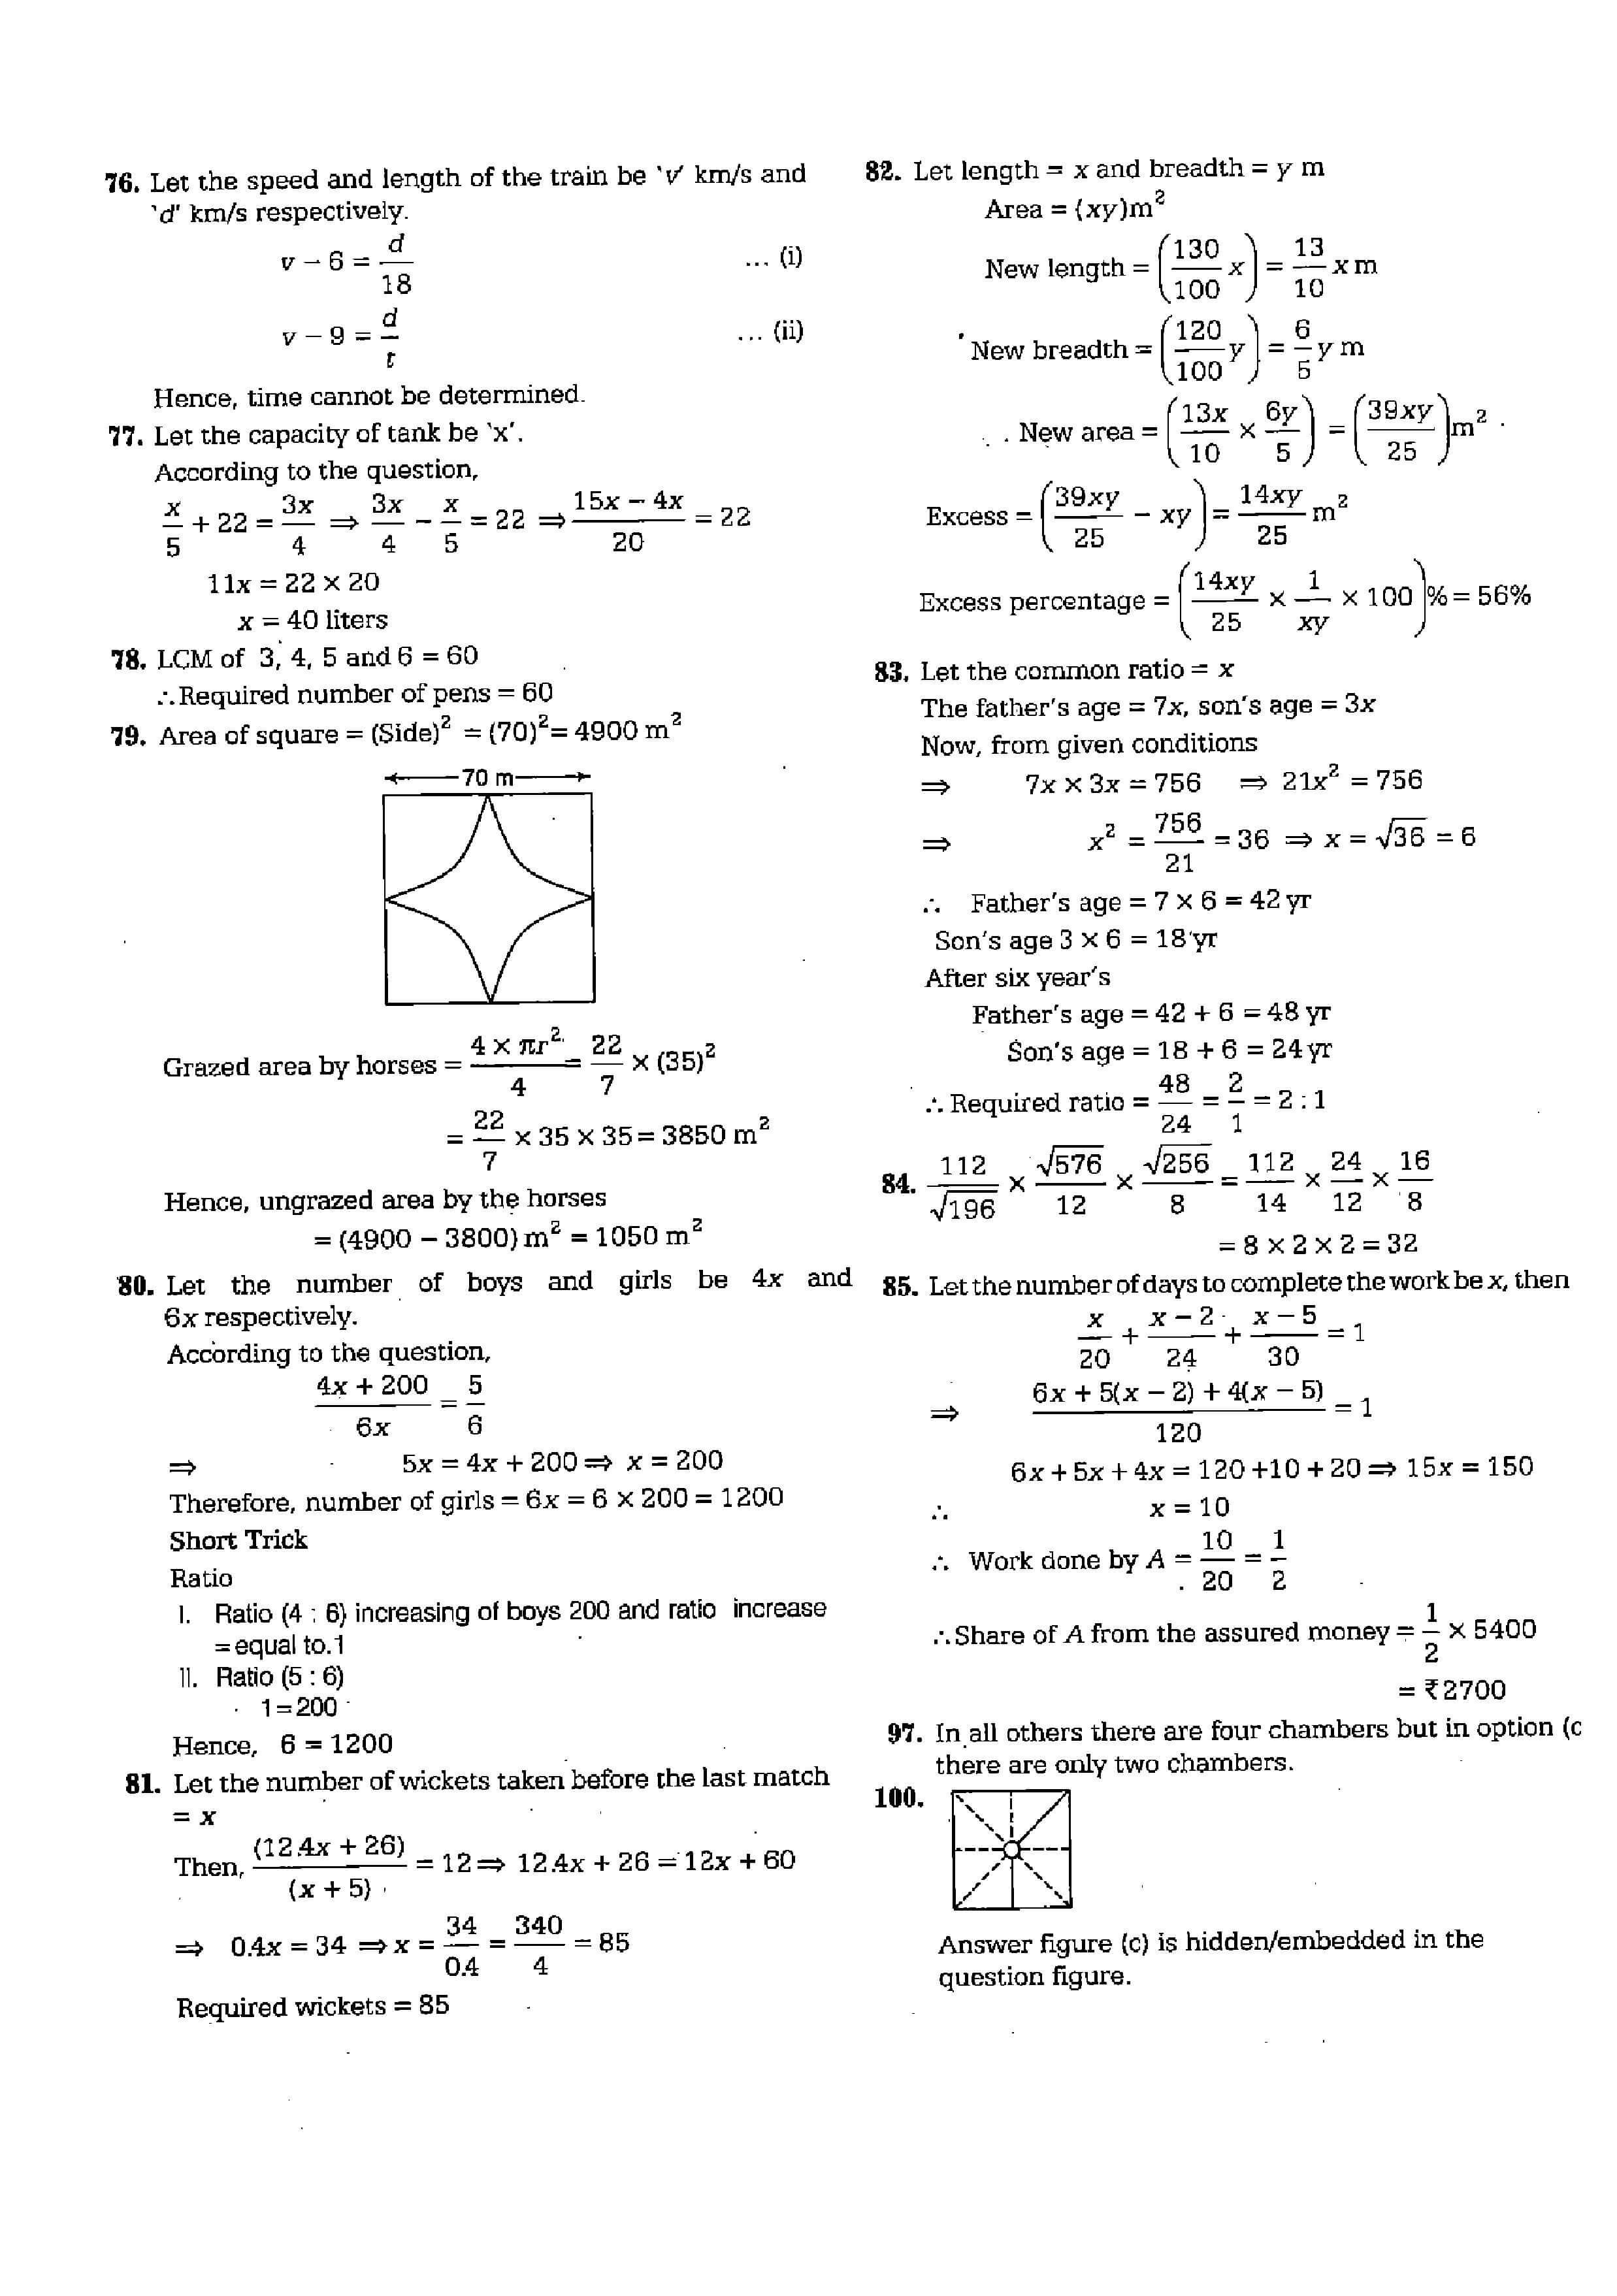 AFCAT 2 2020 Question Paper solved 08